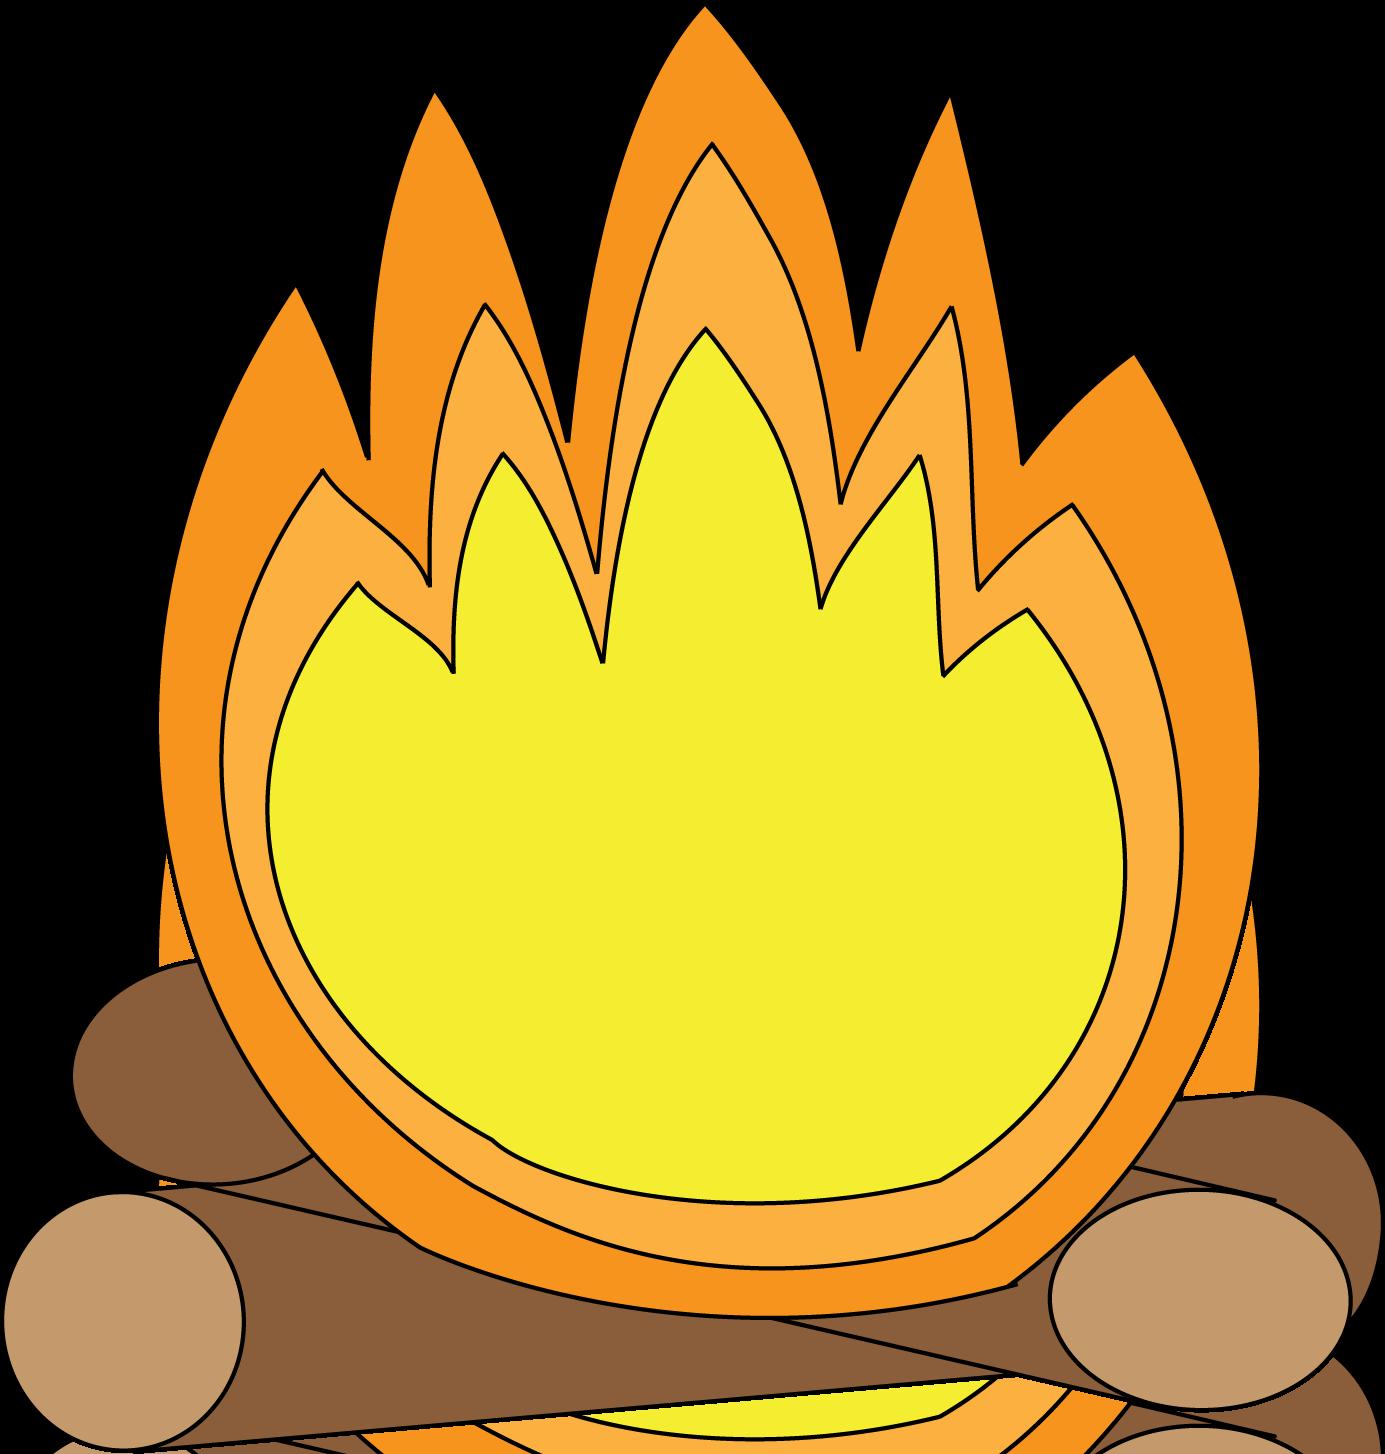 Campfire clipart 3